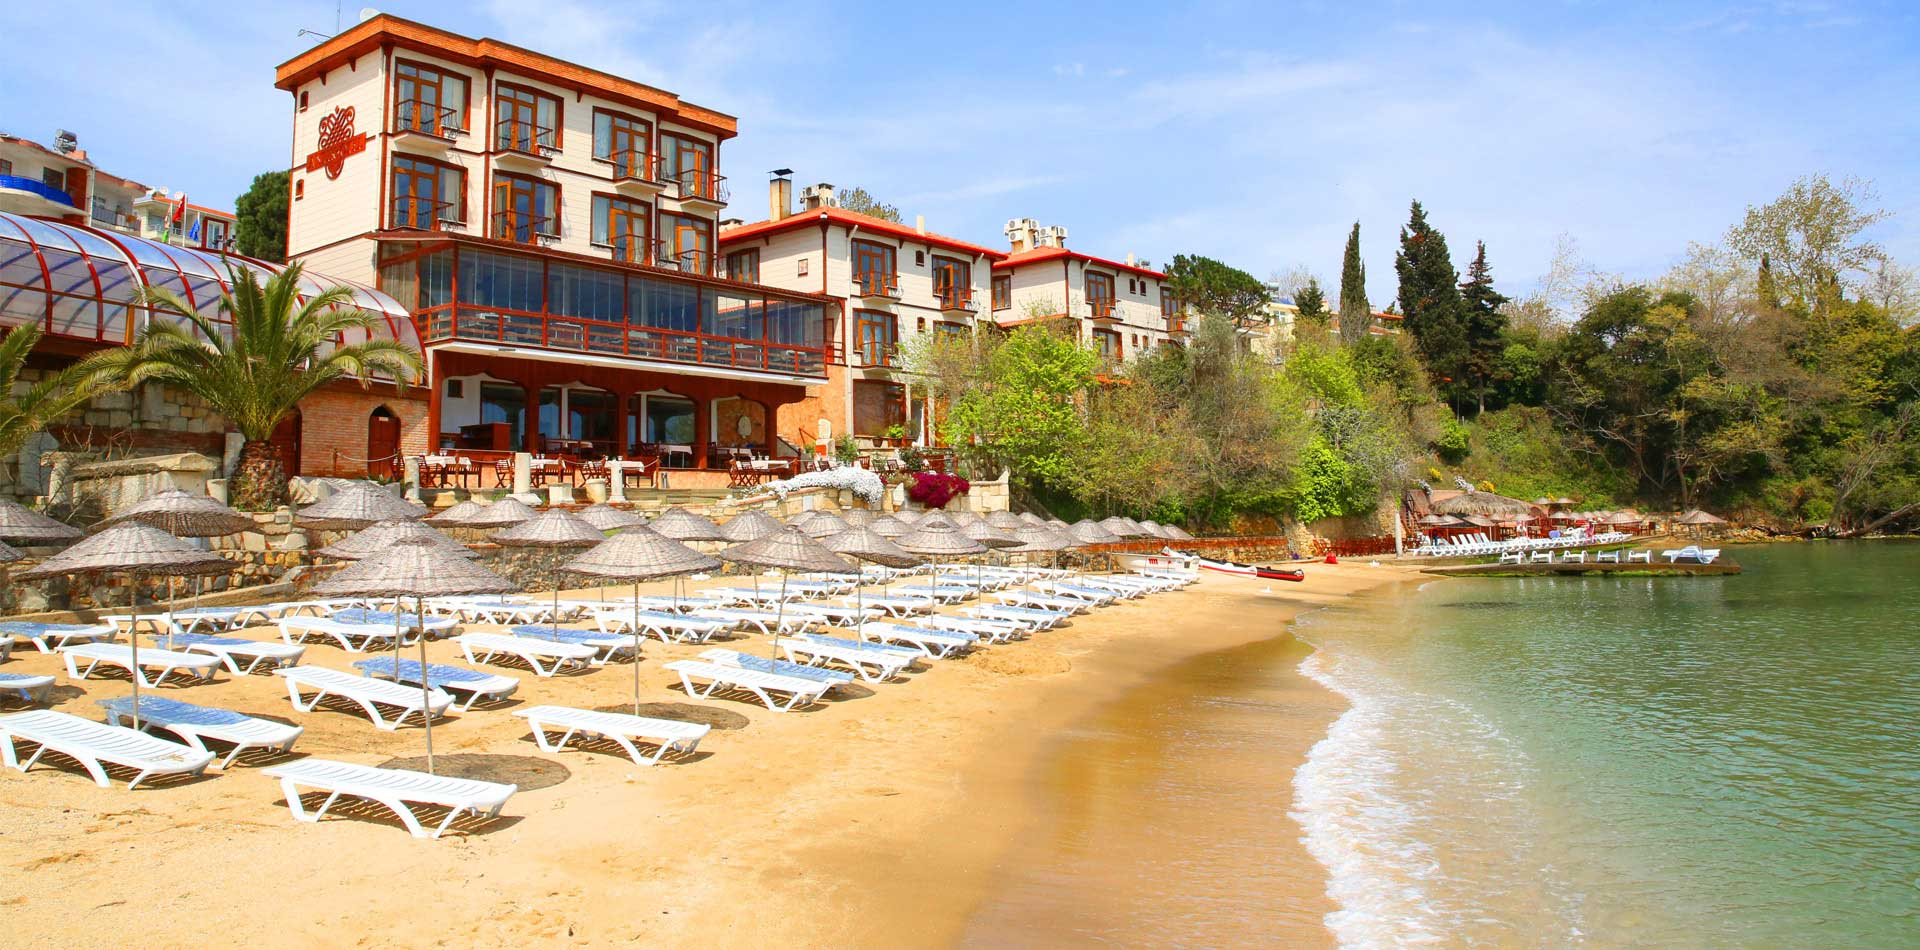 >Sinop Antik Otel | Sinop | 0368 261 25 26 dedans Cash Piscine Le Cres